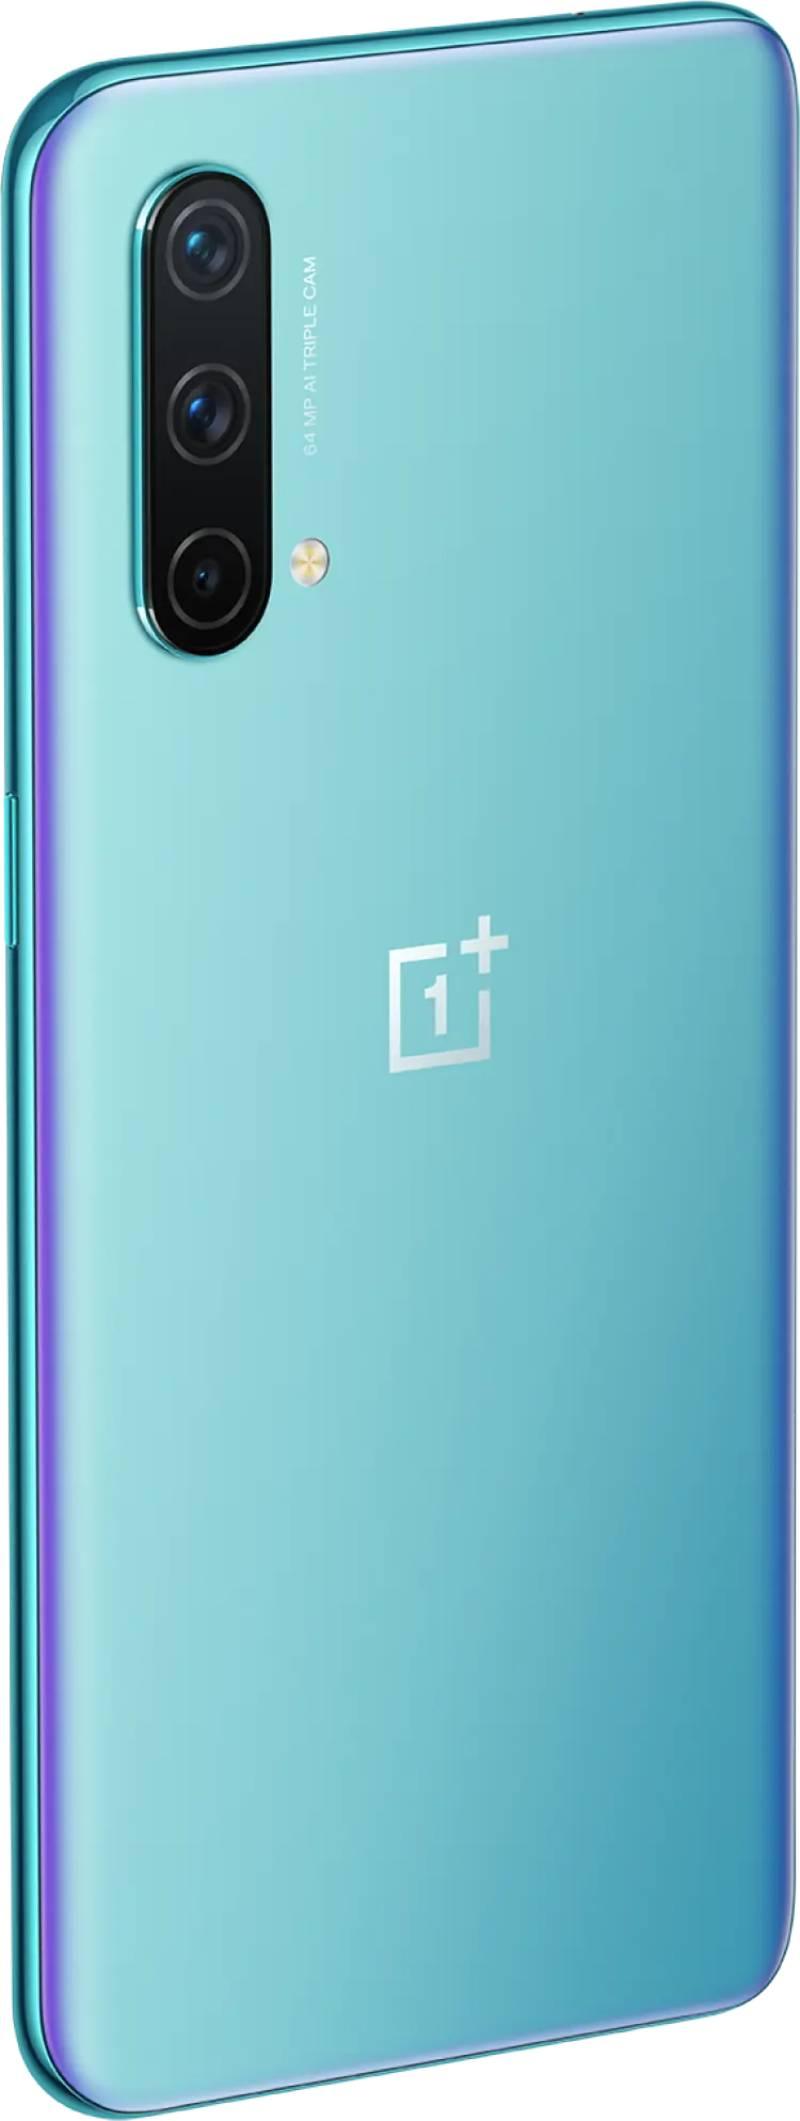 OnePlus Smartphone Nord CE (8+128GB) (5G)